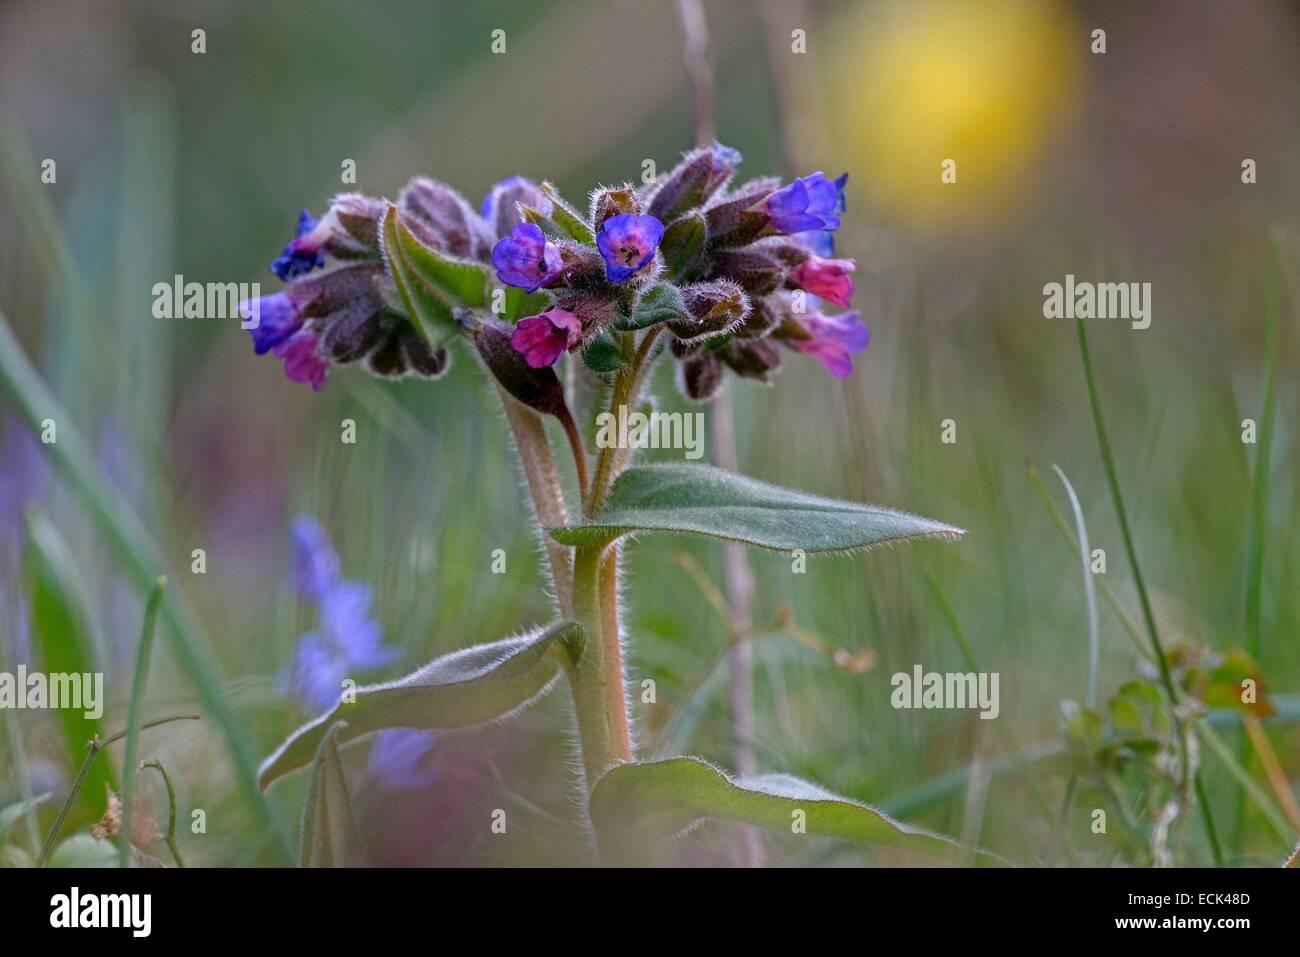 France, Doubs, flora, Pulmonary officinale (Pulmonaria officinalis) - Stock Image